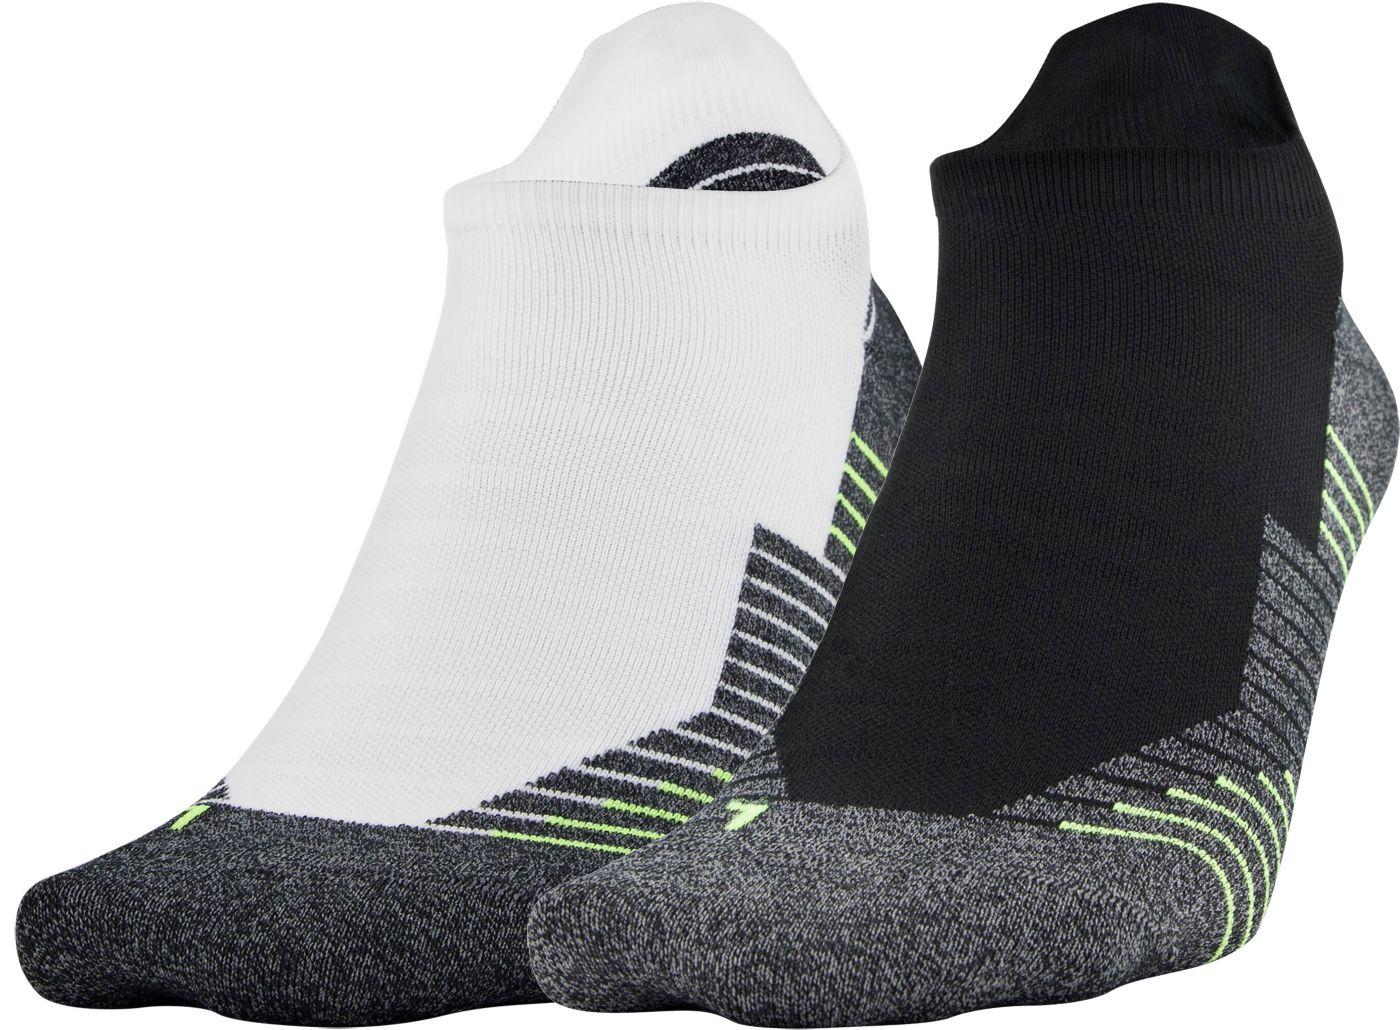 Under Armour Run 2.0 No Show Tab Socks - 2 Pack